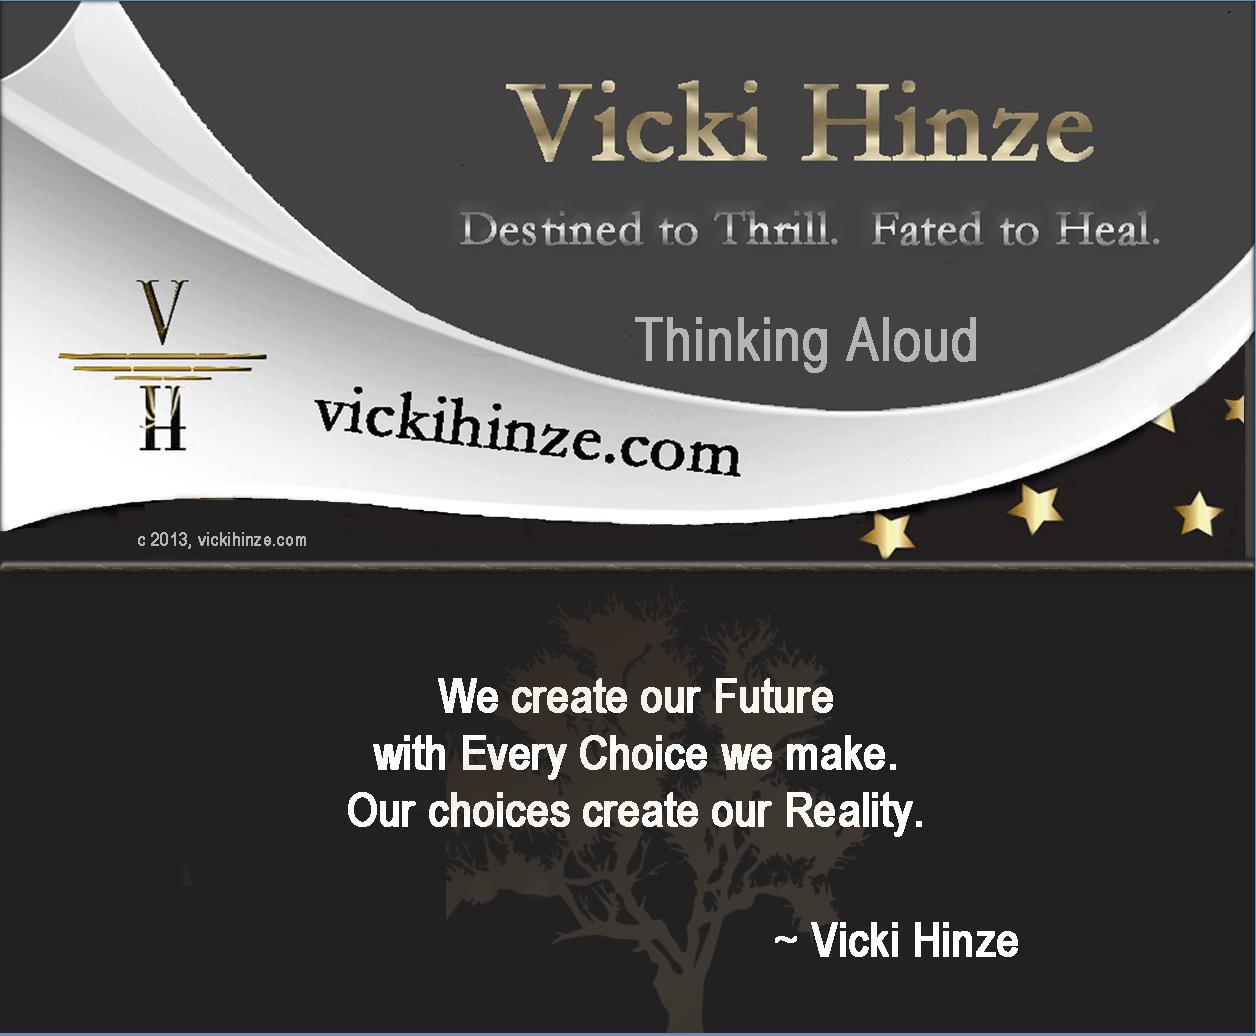 Vicki Hinze, future, reality, thinking aloud